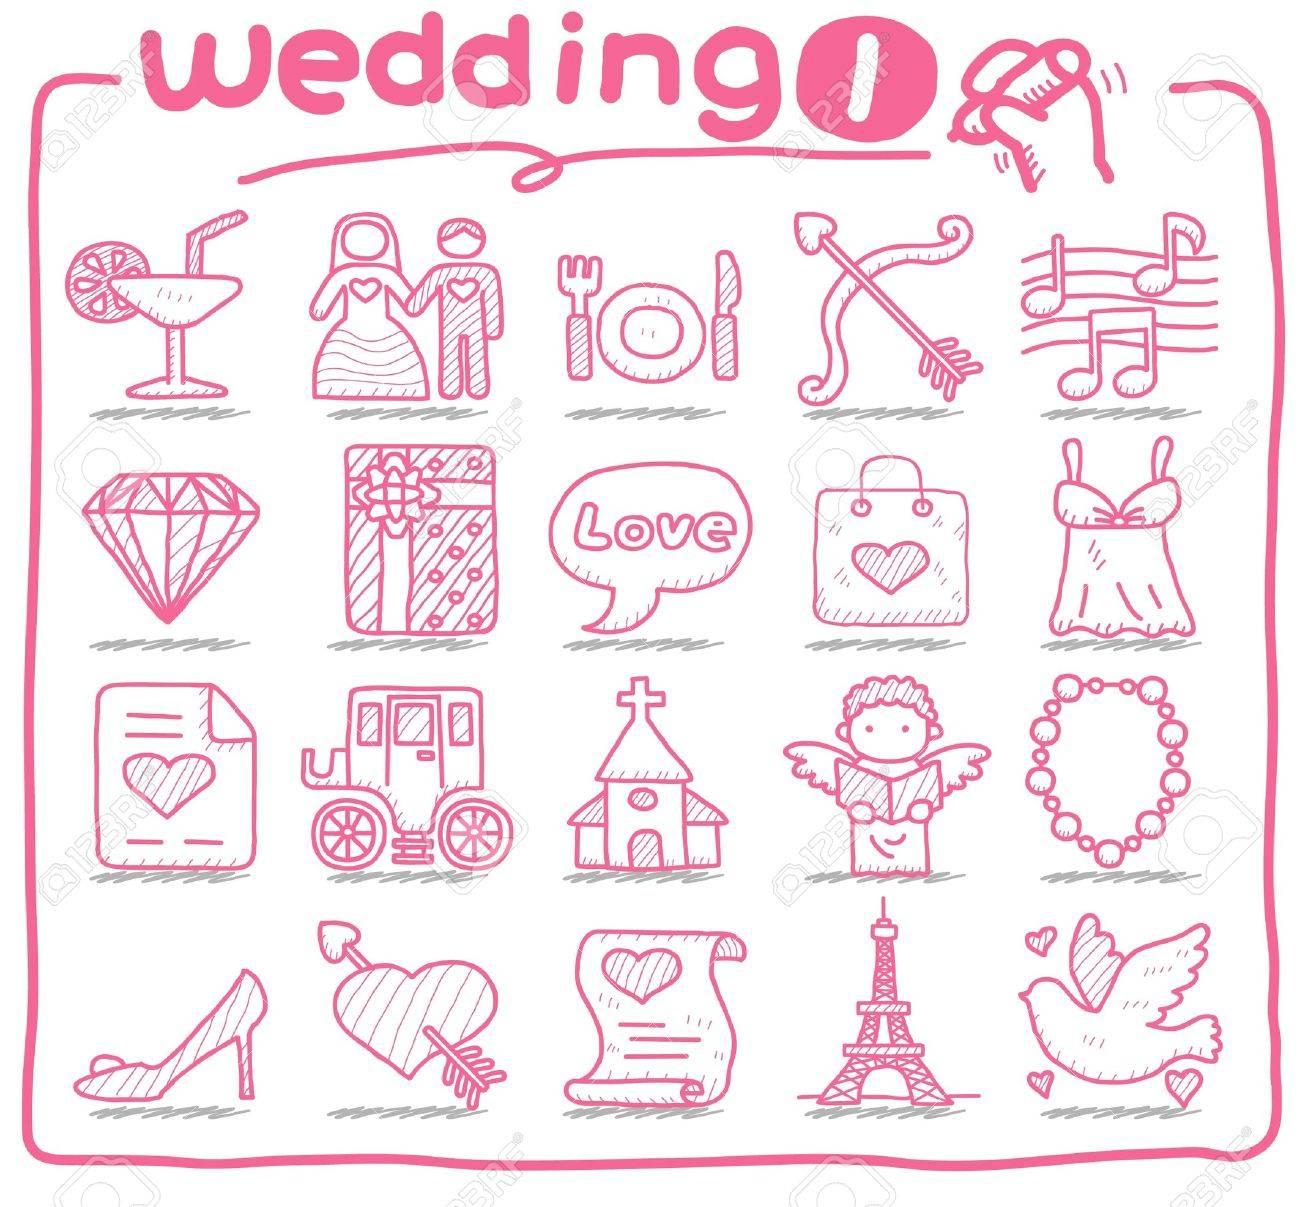 hand drawn wedding icons - 10556196